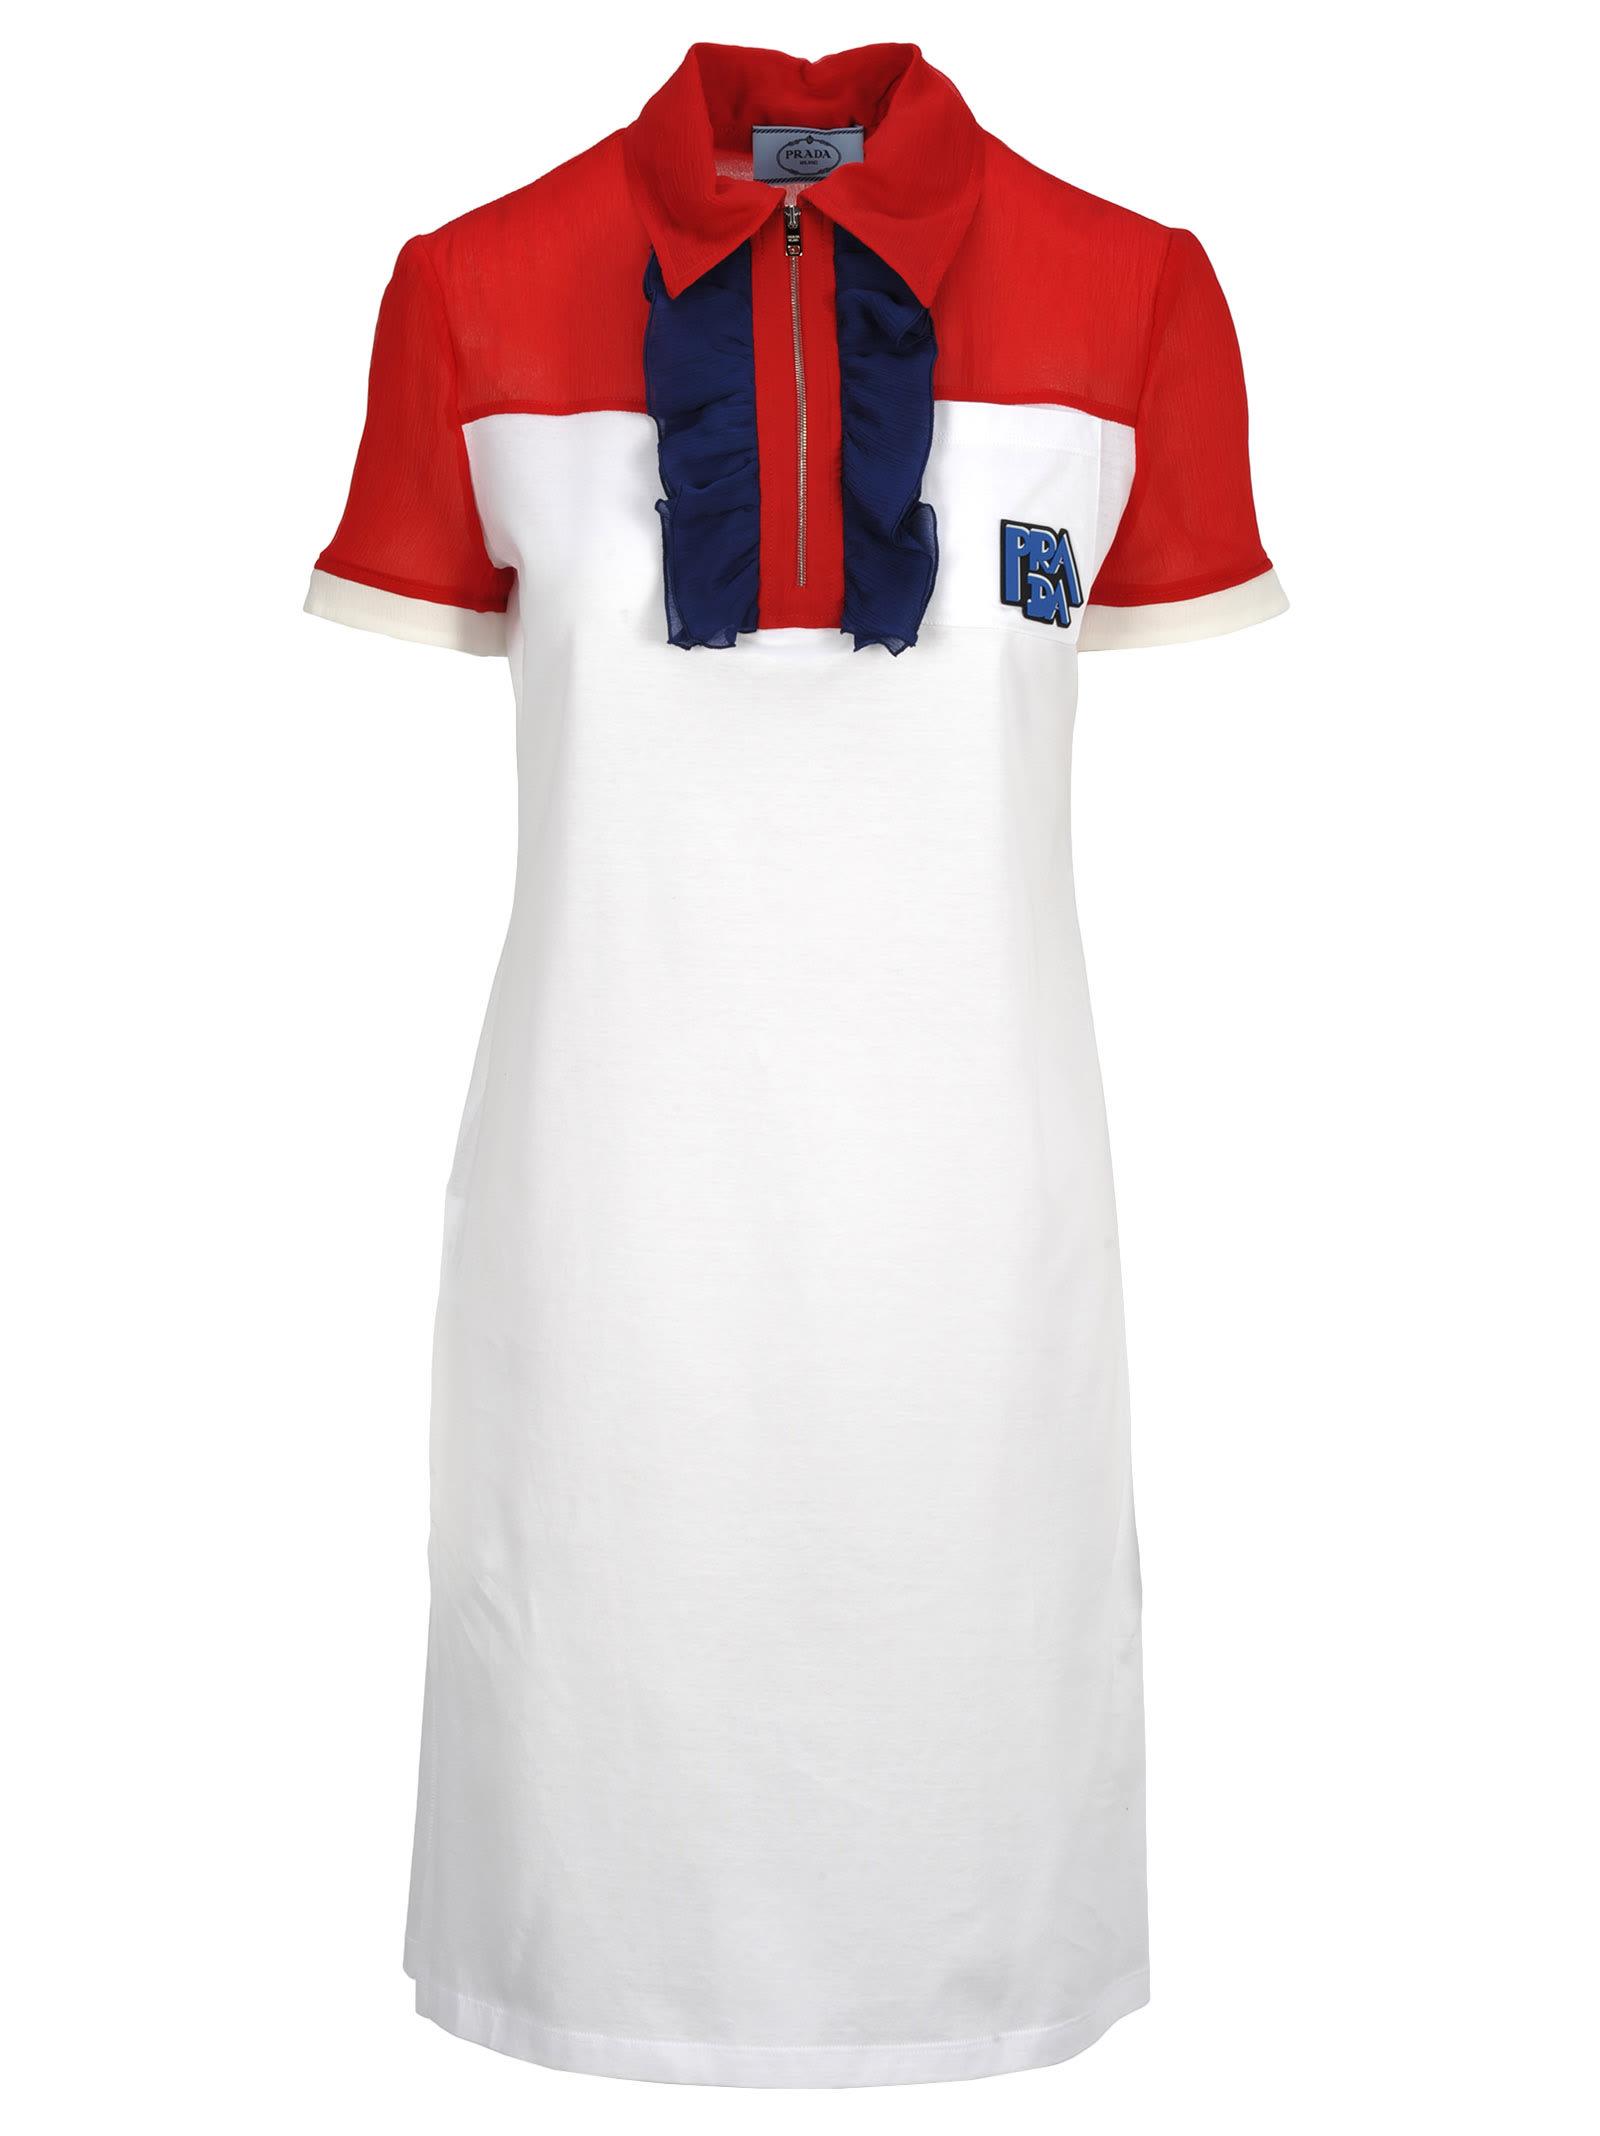 Photo of  Prada Prada Ruffled Polo Shirt Style Dress- shop Prada  online sales